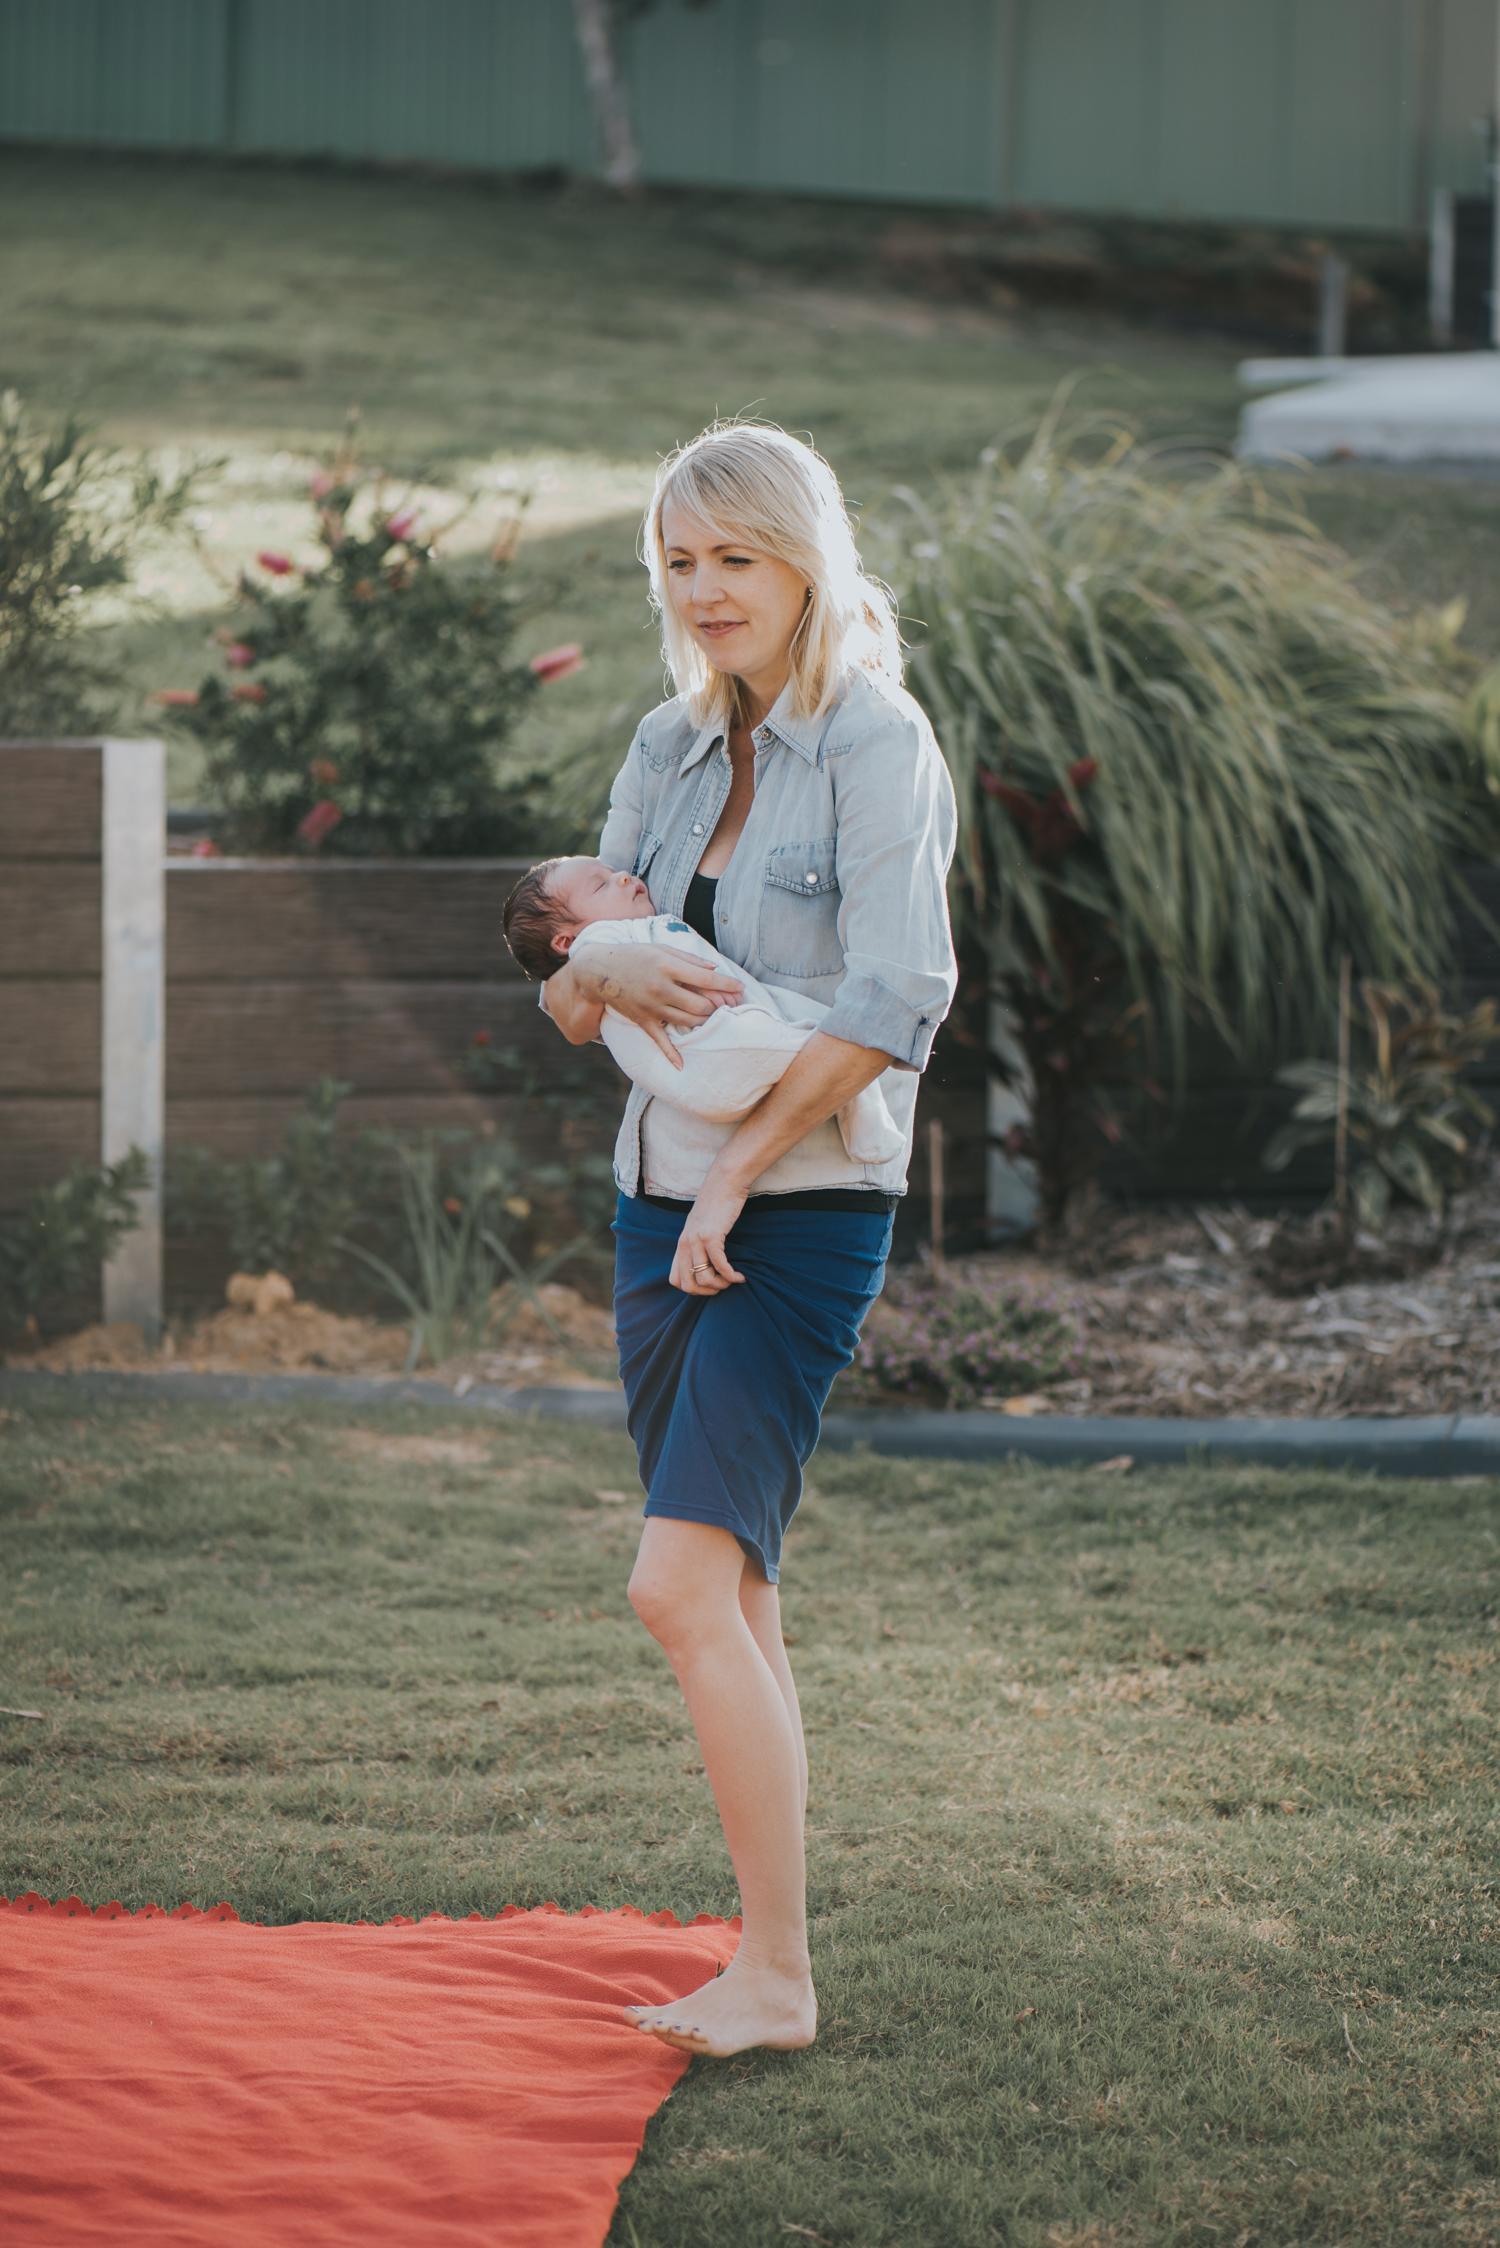 Brisbane Newborn Photography | Lifestyle Photography-25.jpg